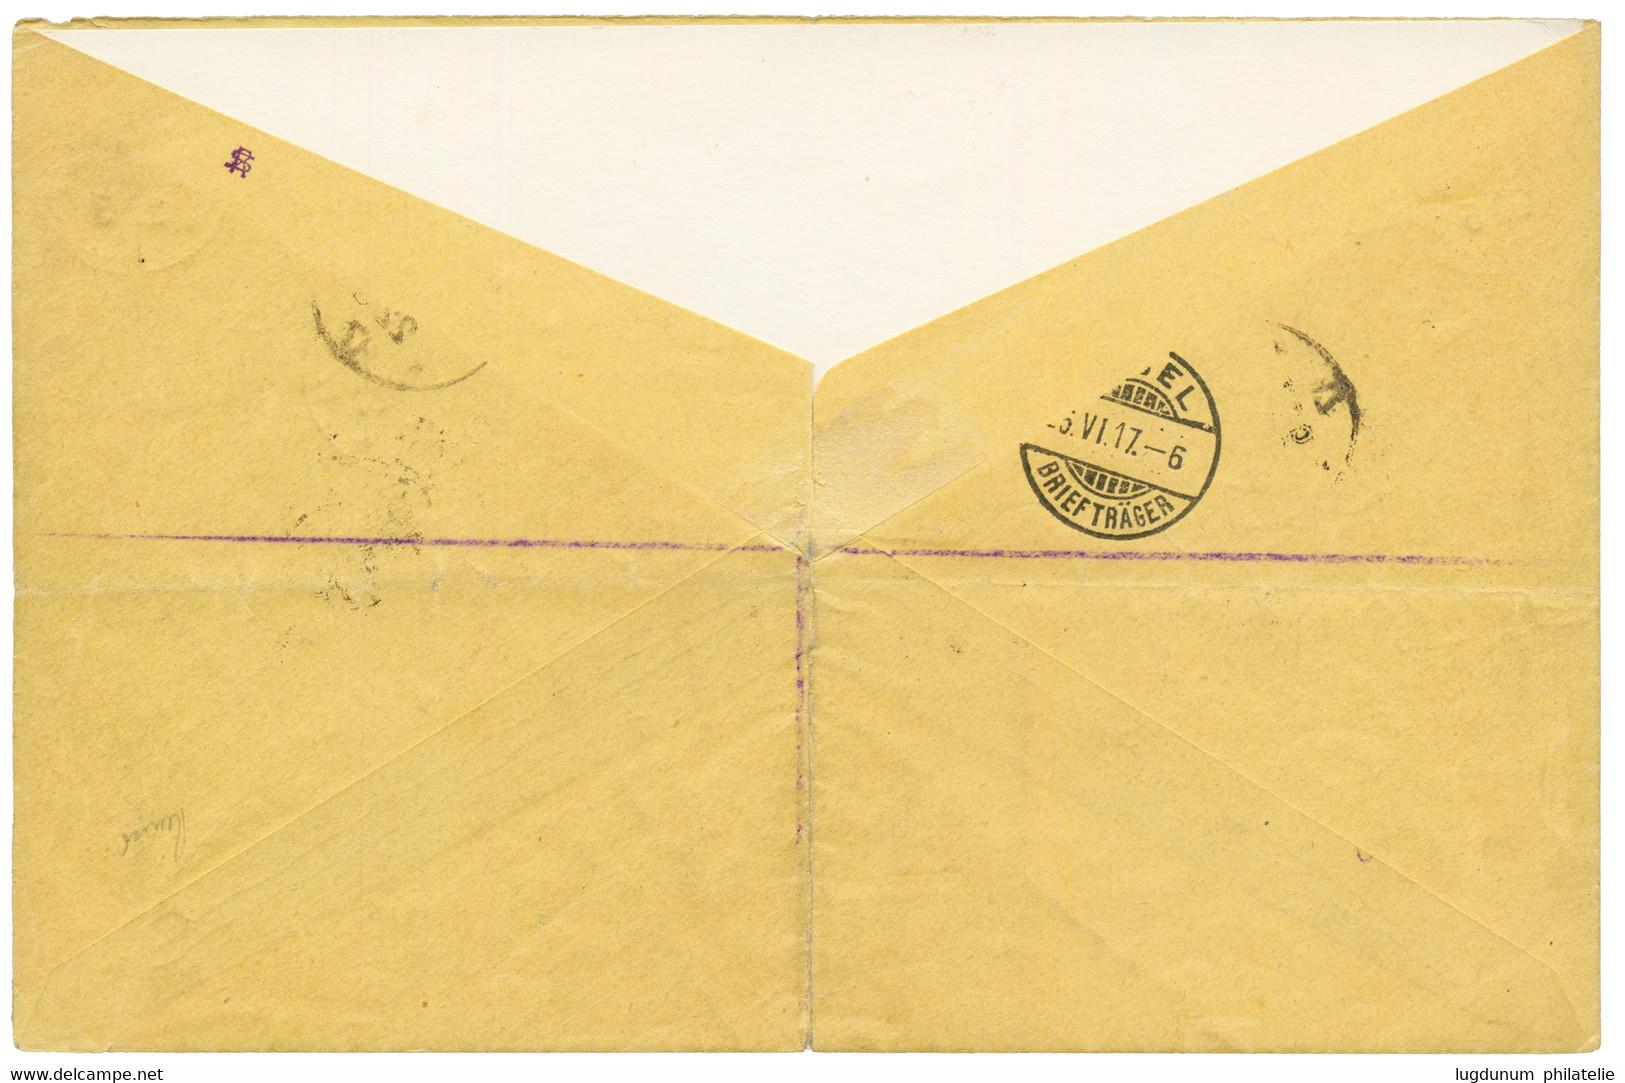 TOGO : 1917 10pf (n°34)x2 + 40pf (n°38) + N°84+ N°85+ N°96 Obl. Cachet Allemand ANECHO TOGO Sur Enveloppe RECOMMANDEE Po - Sin Clasificación